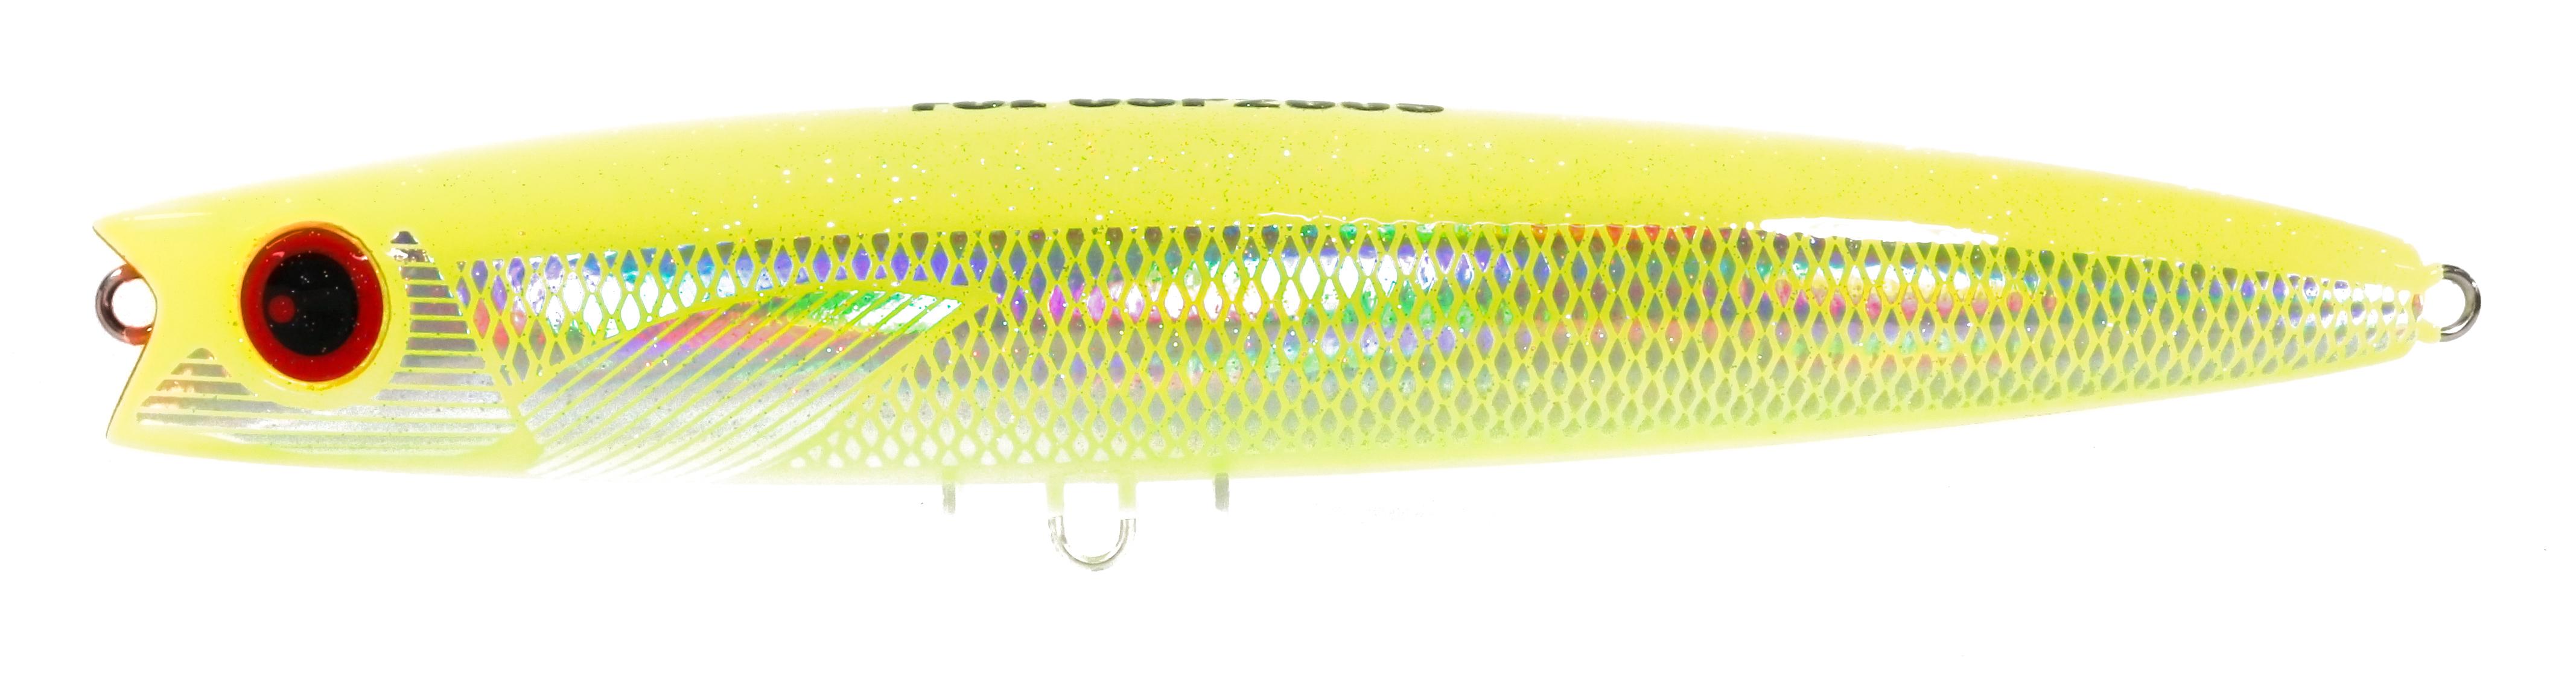 FCL Labo Stick Bait CSP 260S Sinking Lure 220 grams ACH (8052)